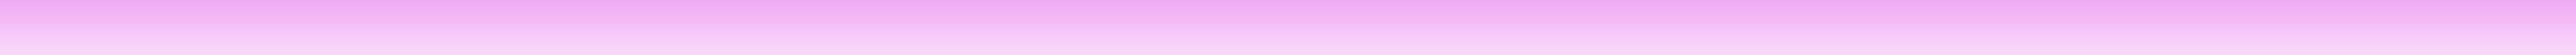 pinkline.png